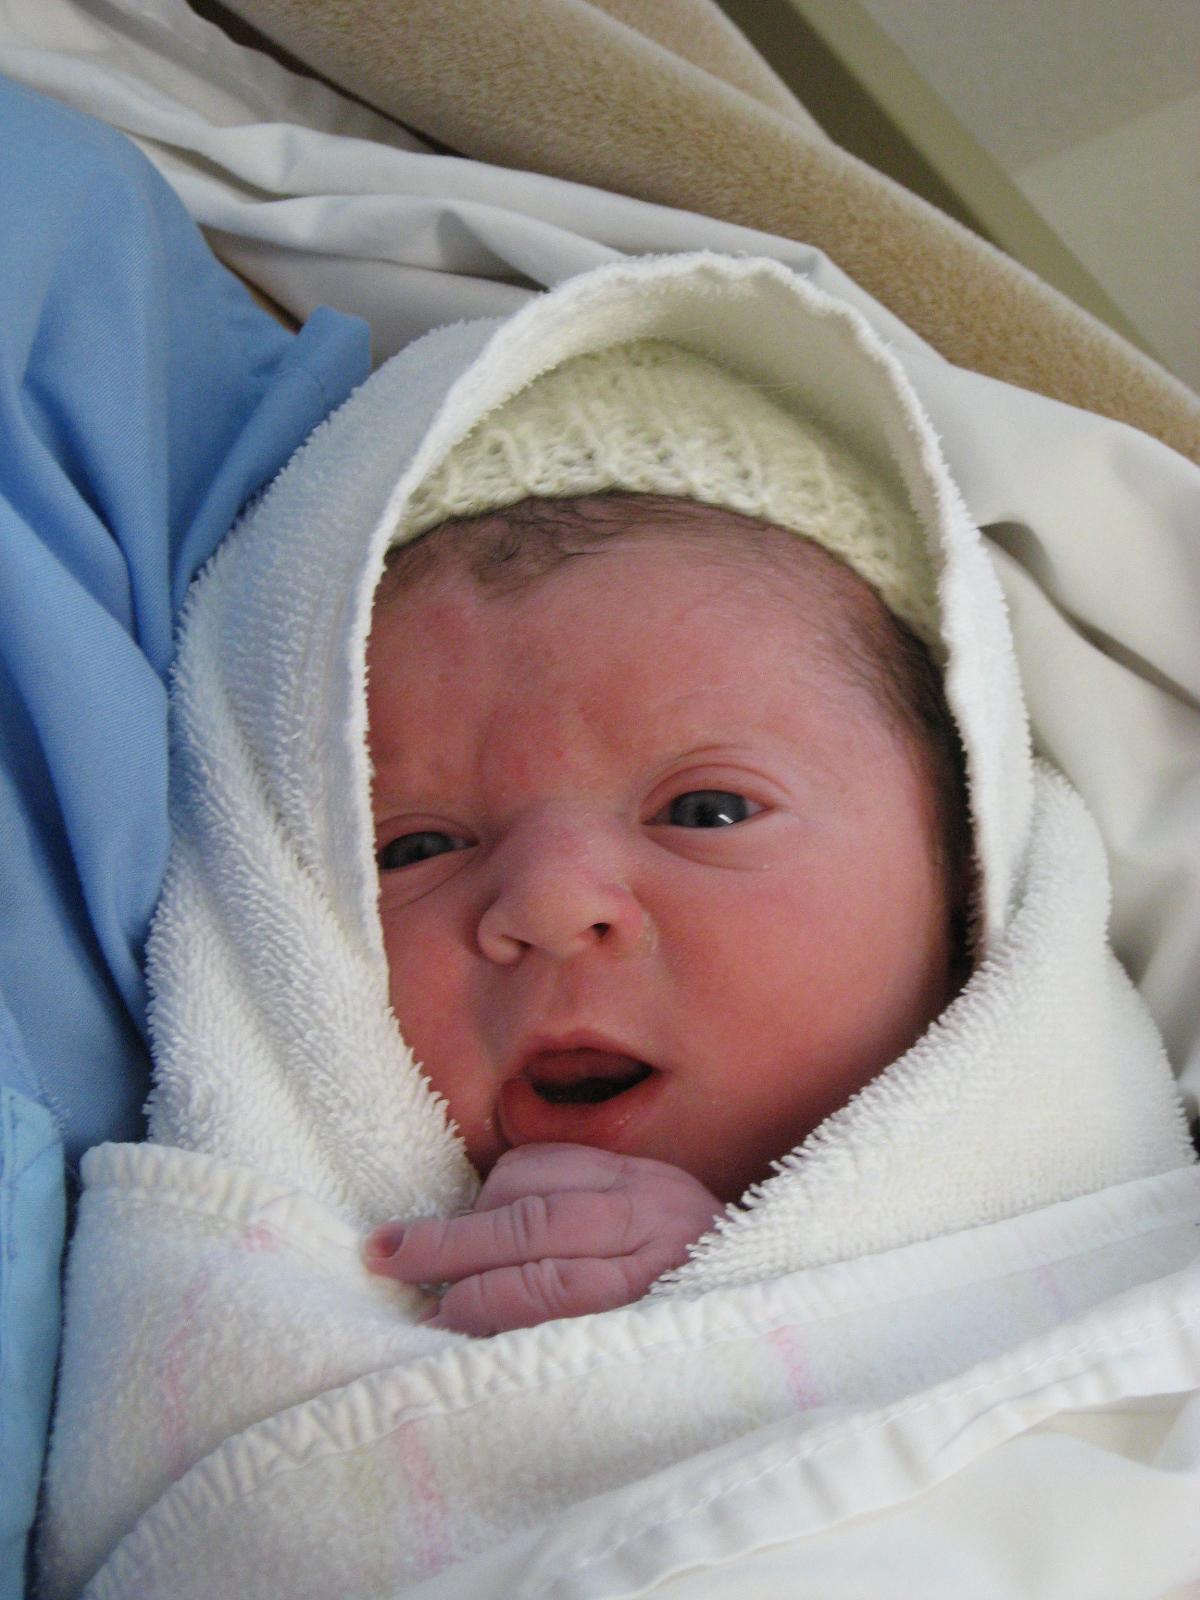 Cute newborn baby boy newborn baby pictures 3d wallpapers hd hd